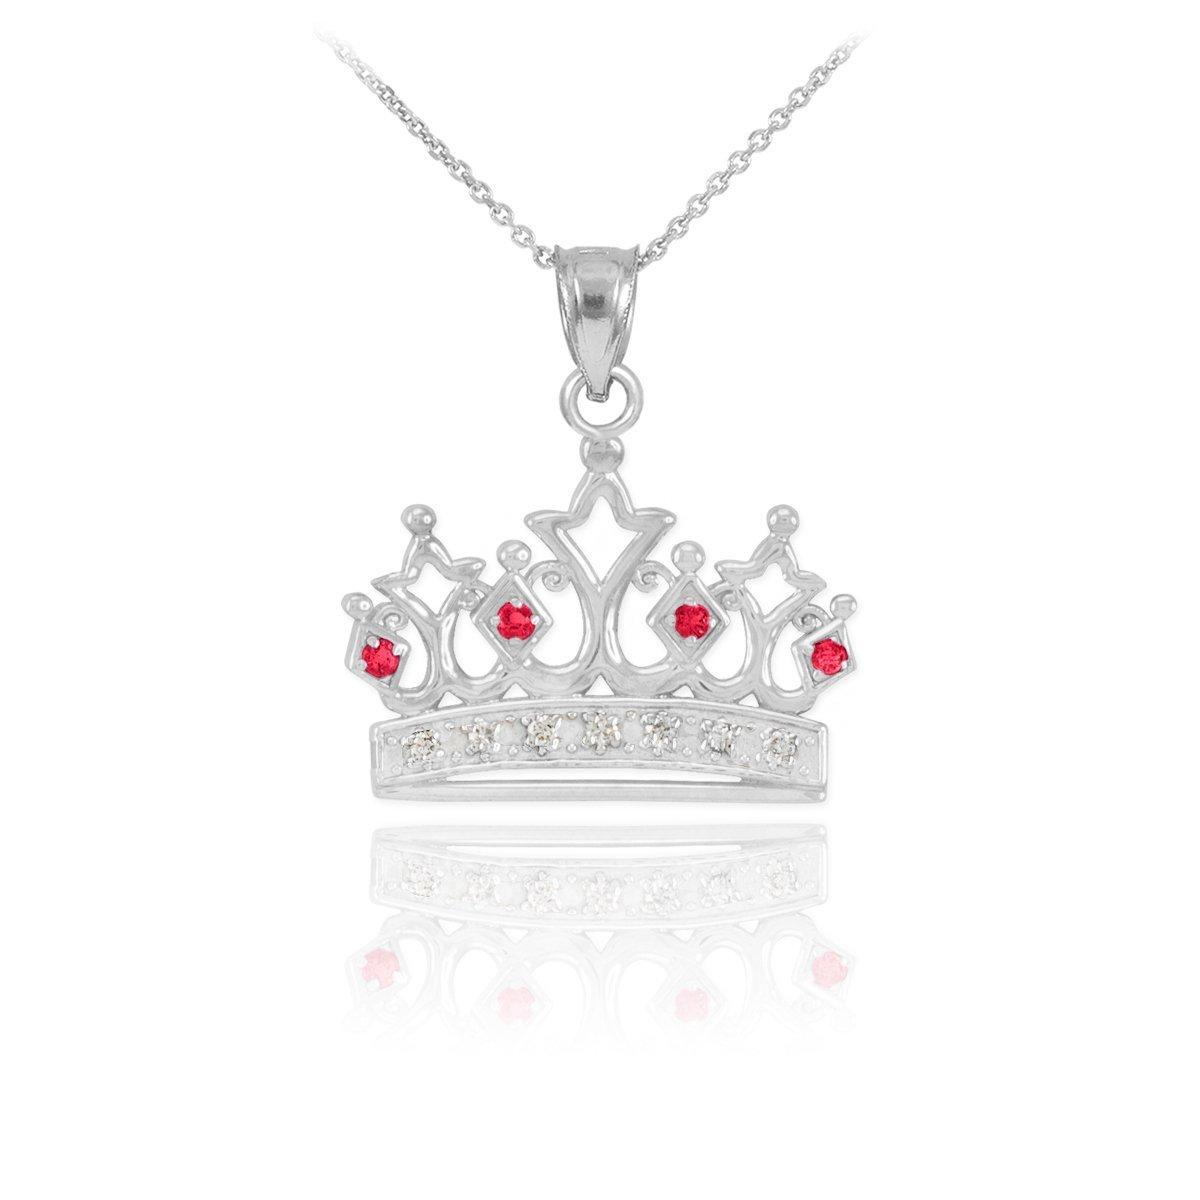 Royal 10k White Gold Ruby and Diamond Tiara Charm Crown Pendant Necklace